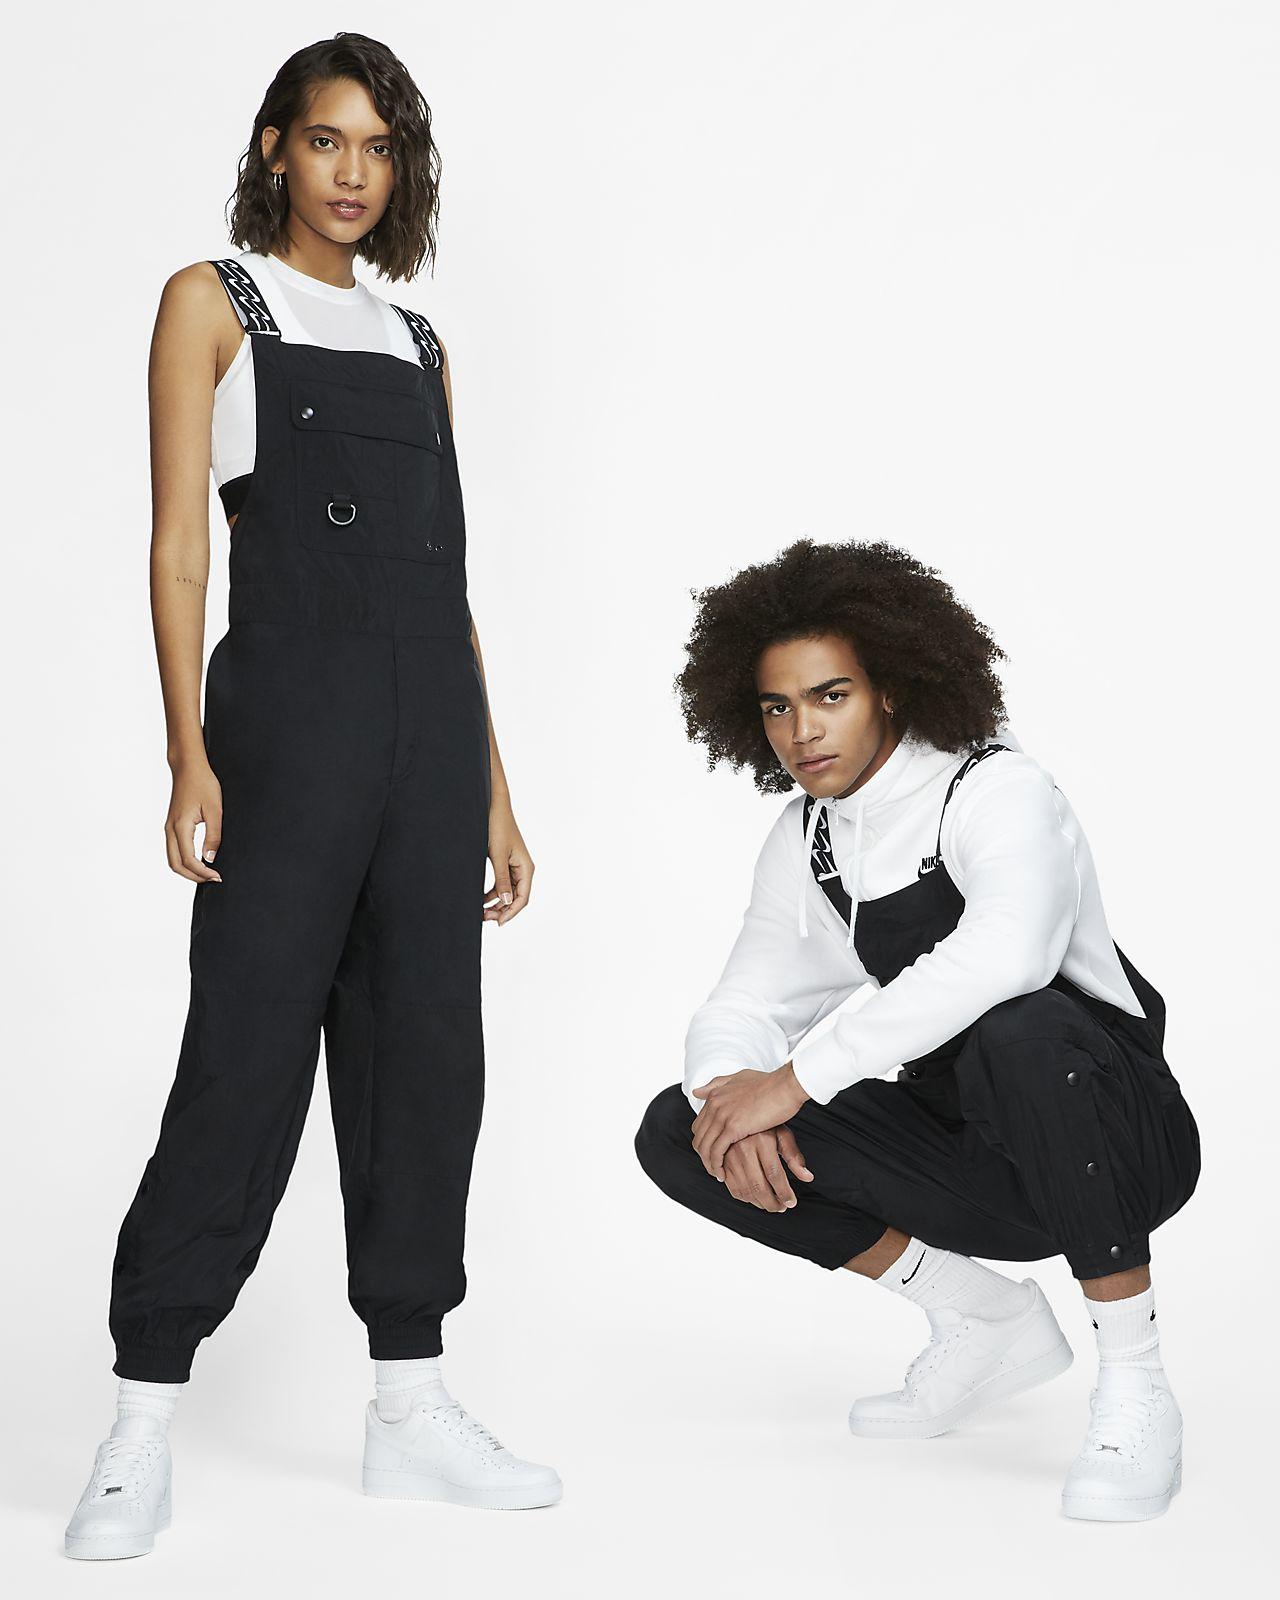 Nike Overalls